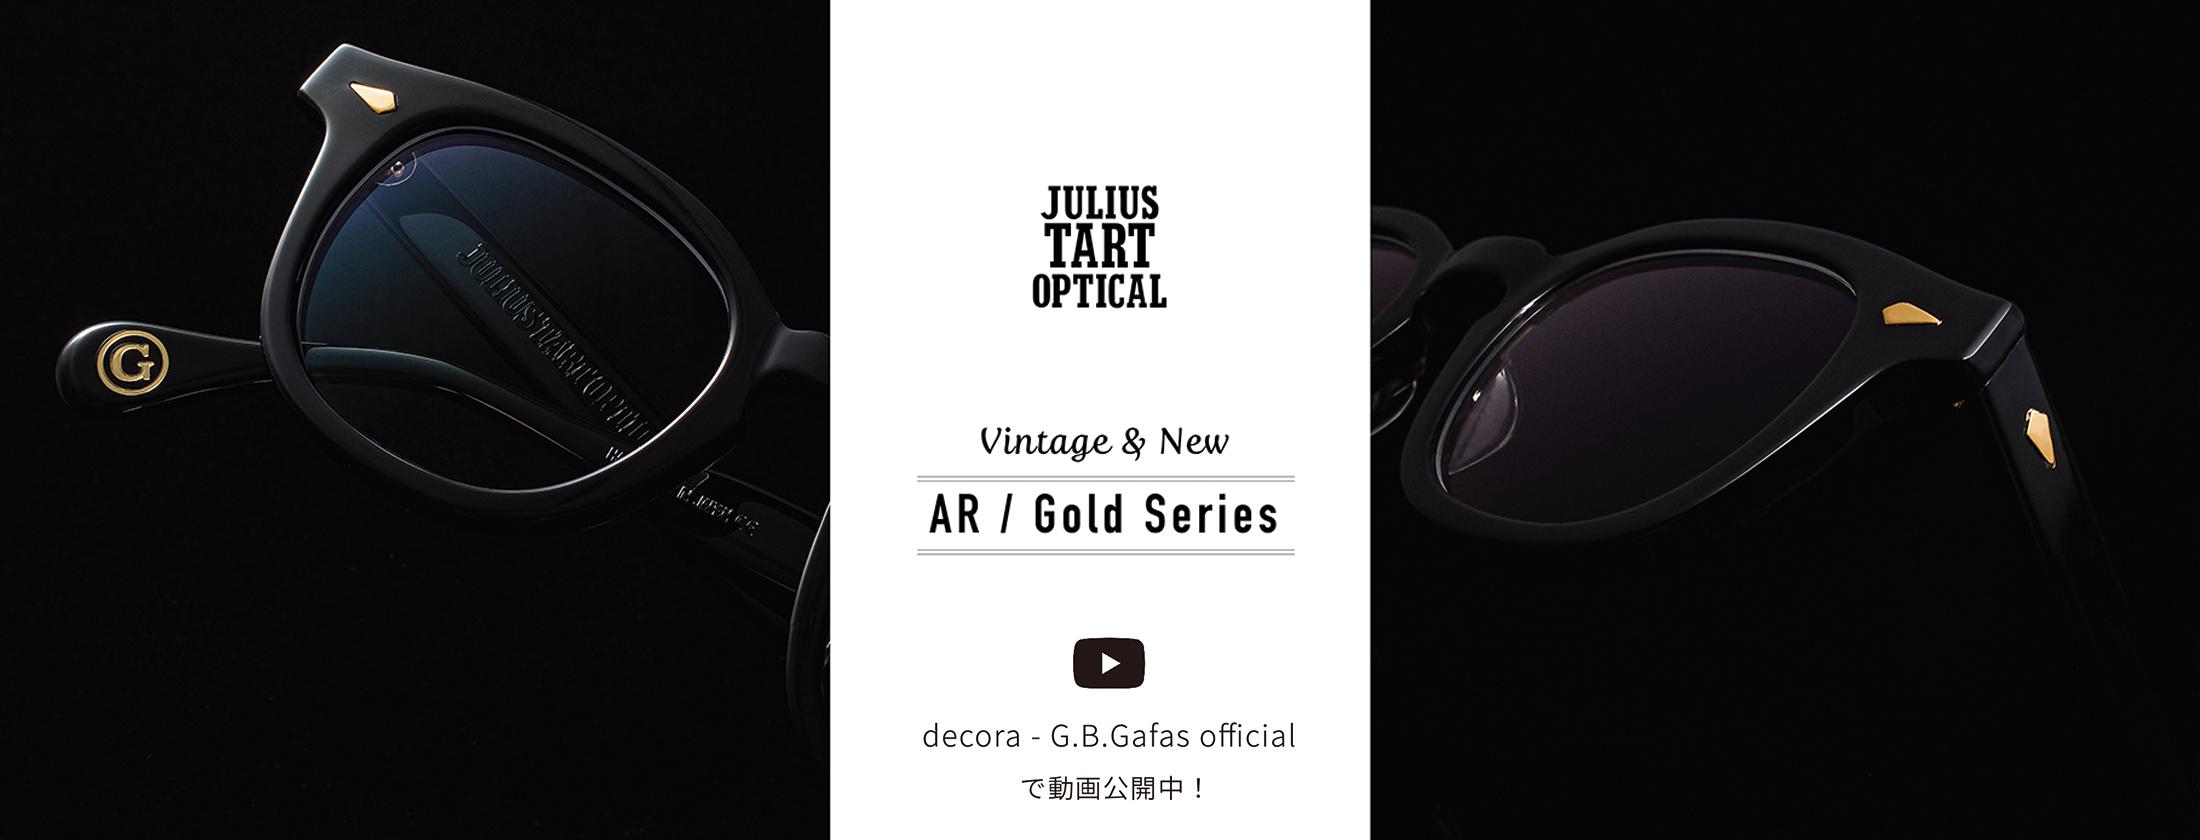 JULIUS TART OPTICAL AR Gold Series